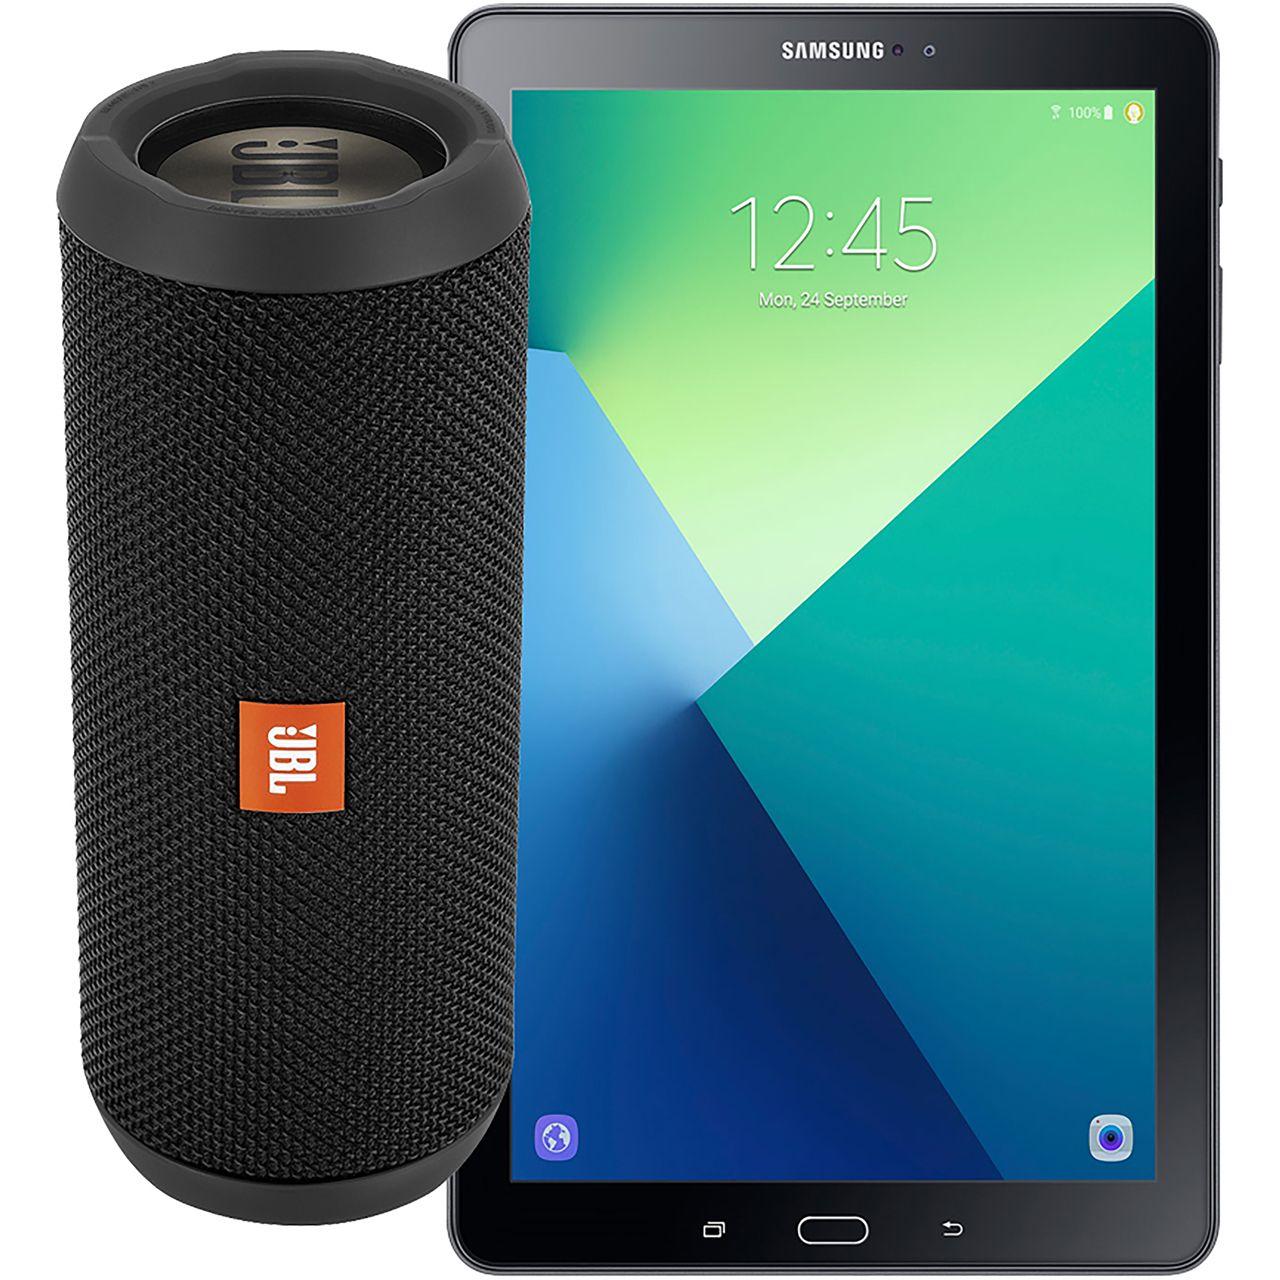 "Samsung Galaxy Tab A 10.1"" 32GB Wifi Tablet [2016] - Black with free JBL speaker £159 @ AO"